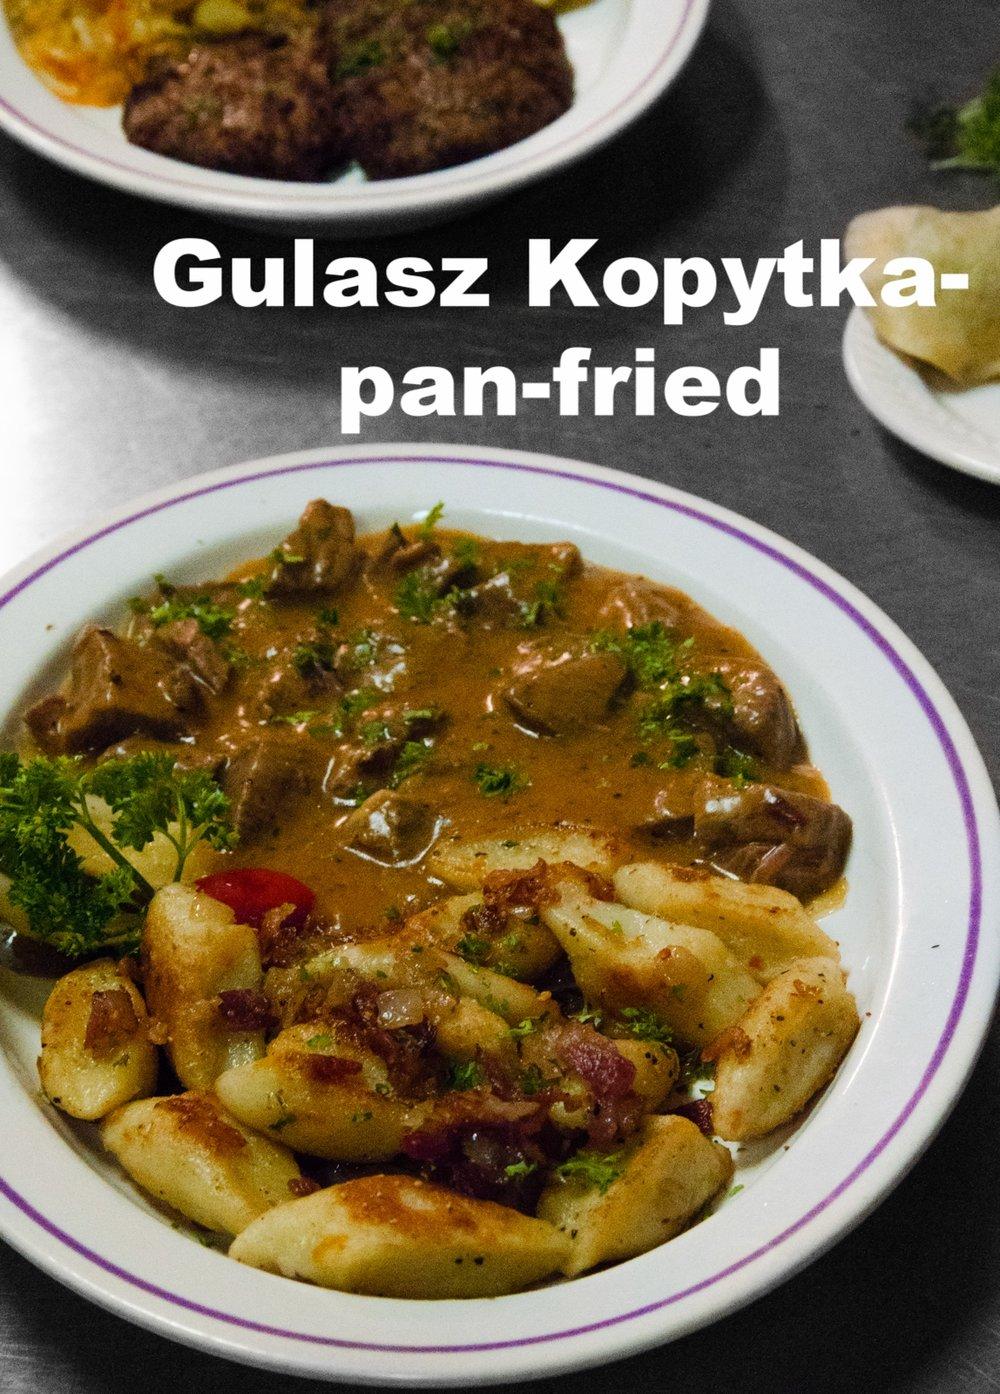 Food - Kopytka and Gulaz.jpg